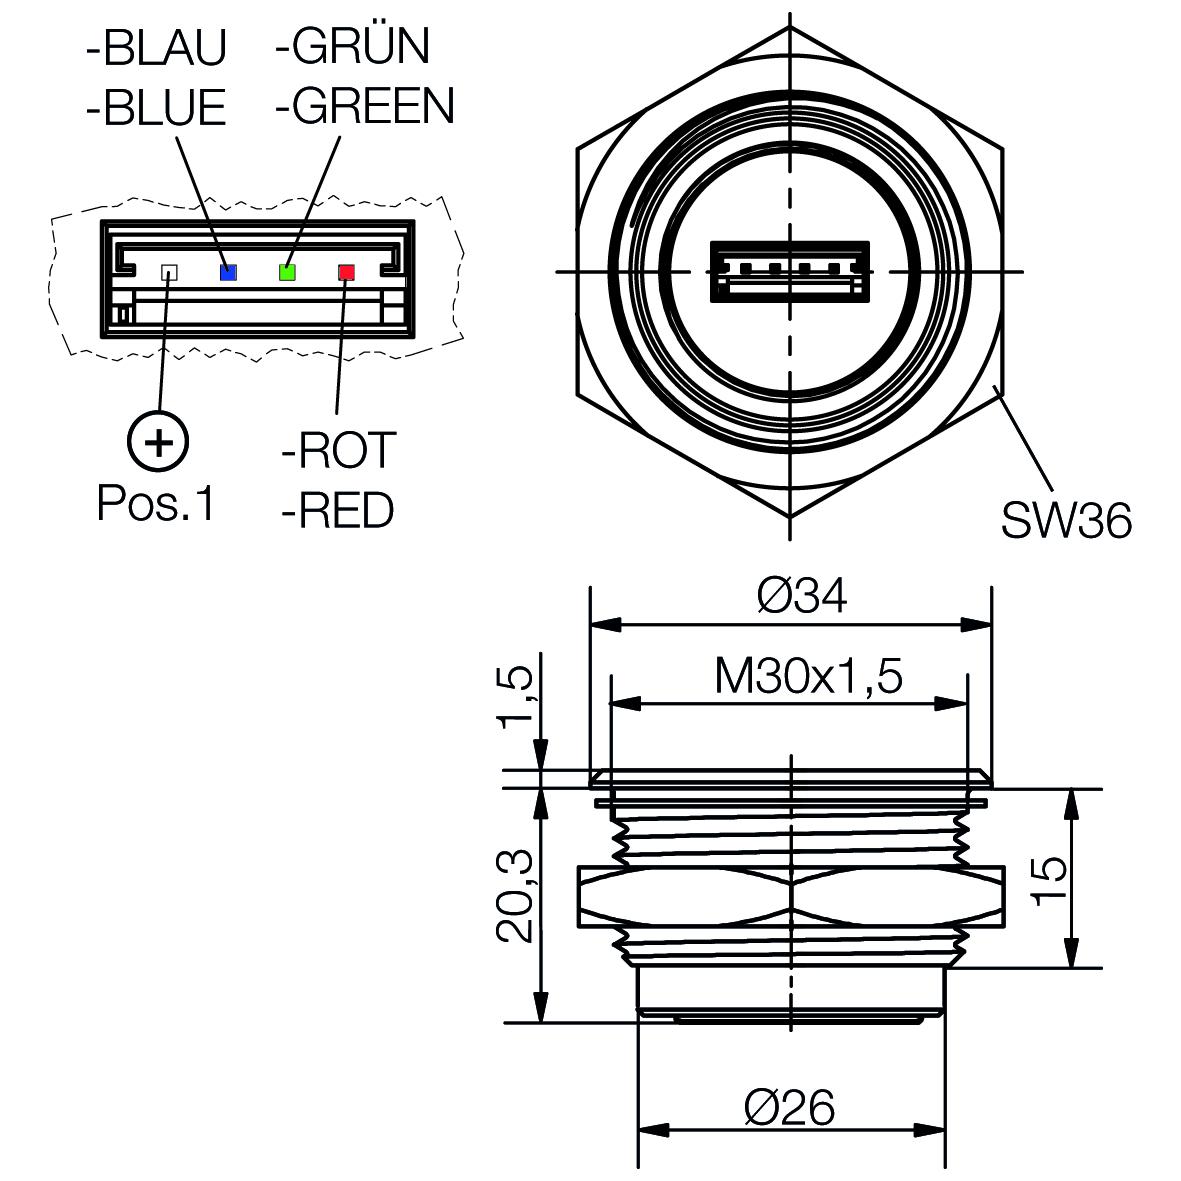 RGB Mini-LED-Spot Ø30mm multicolor für RGB Controller gemeinsame Anode - plan